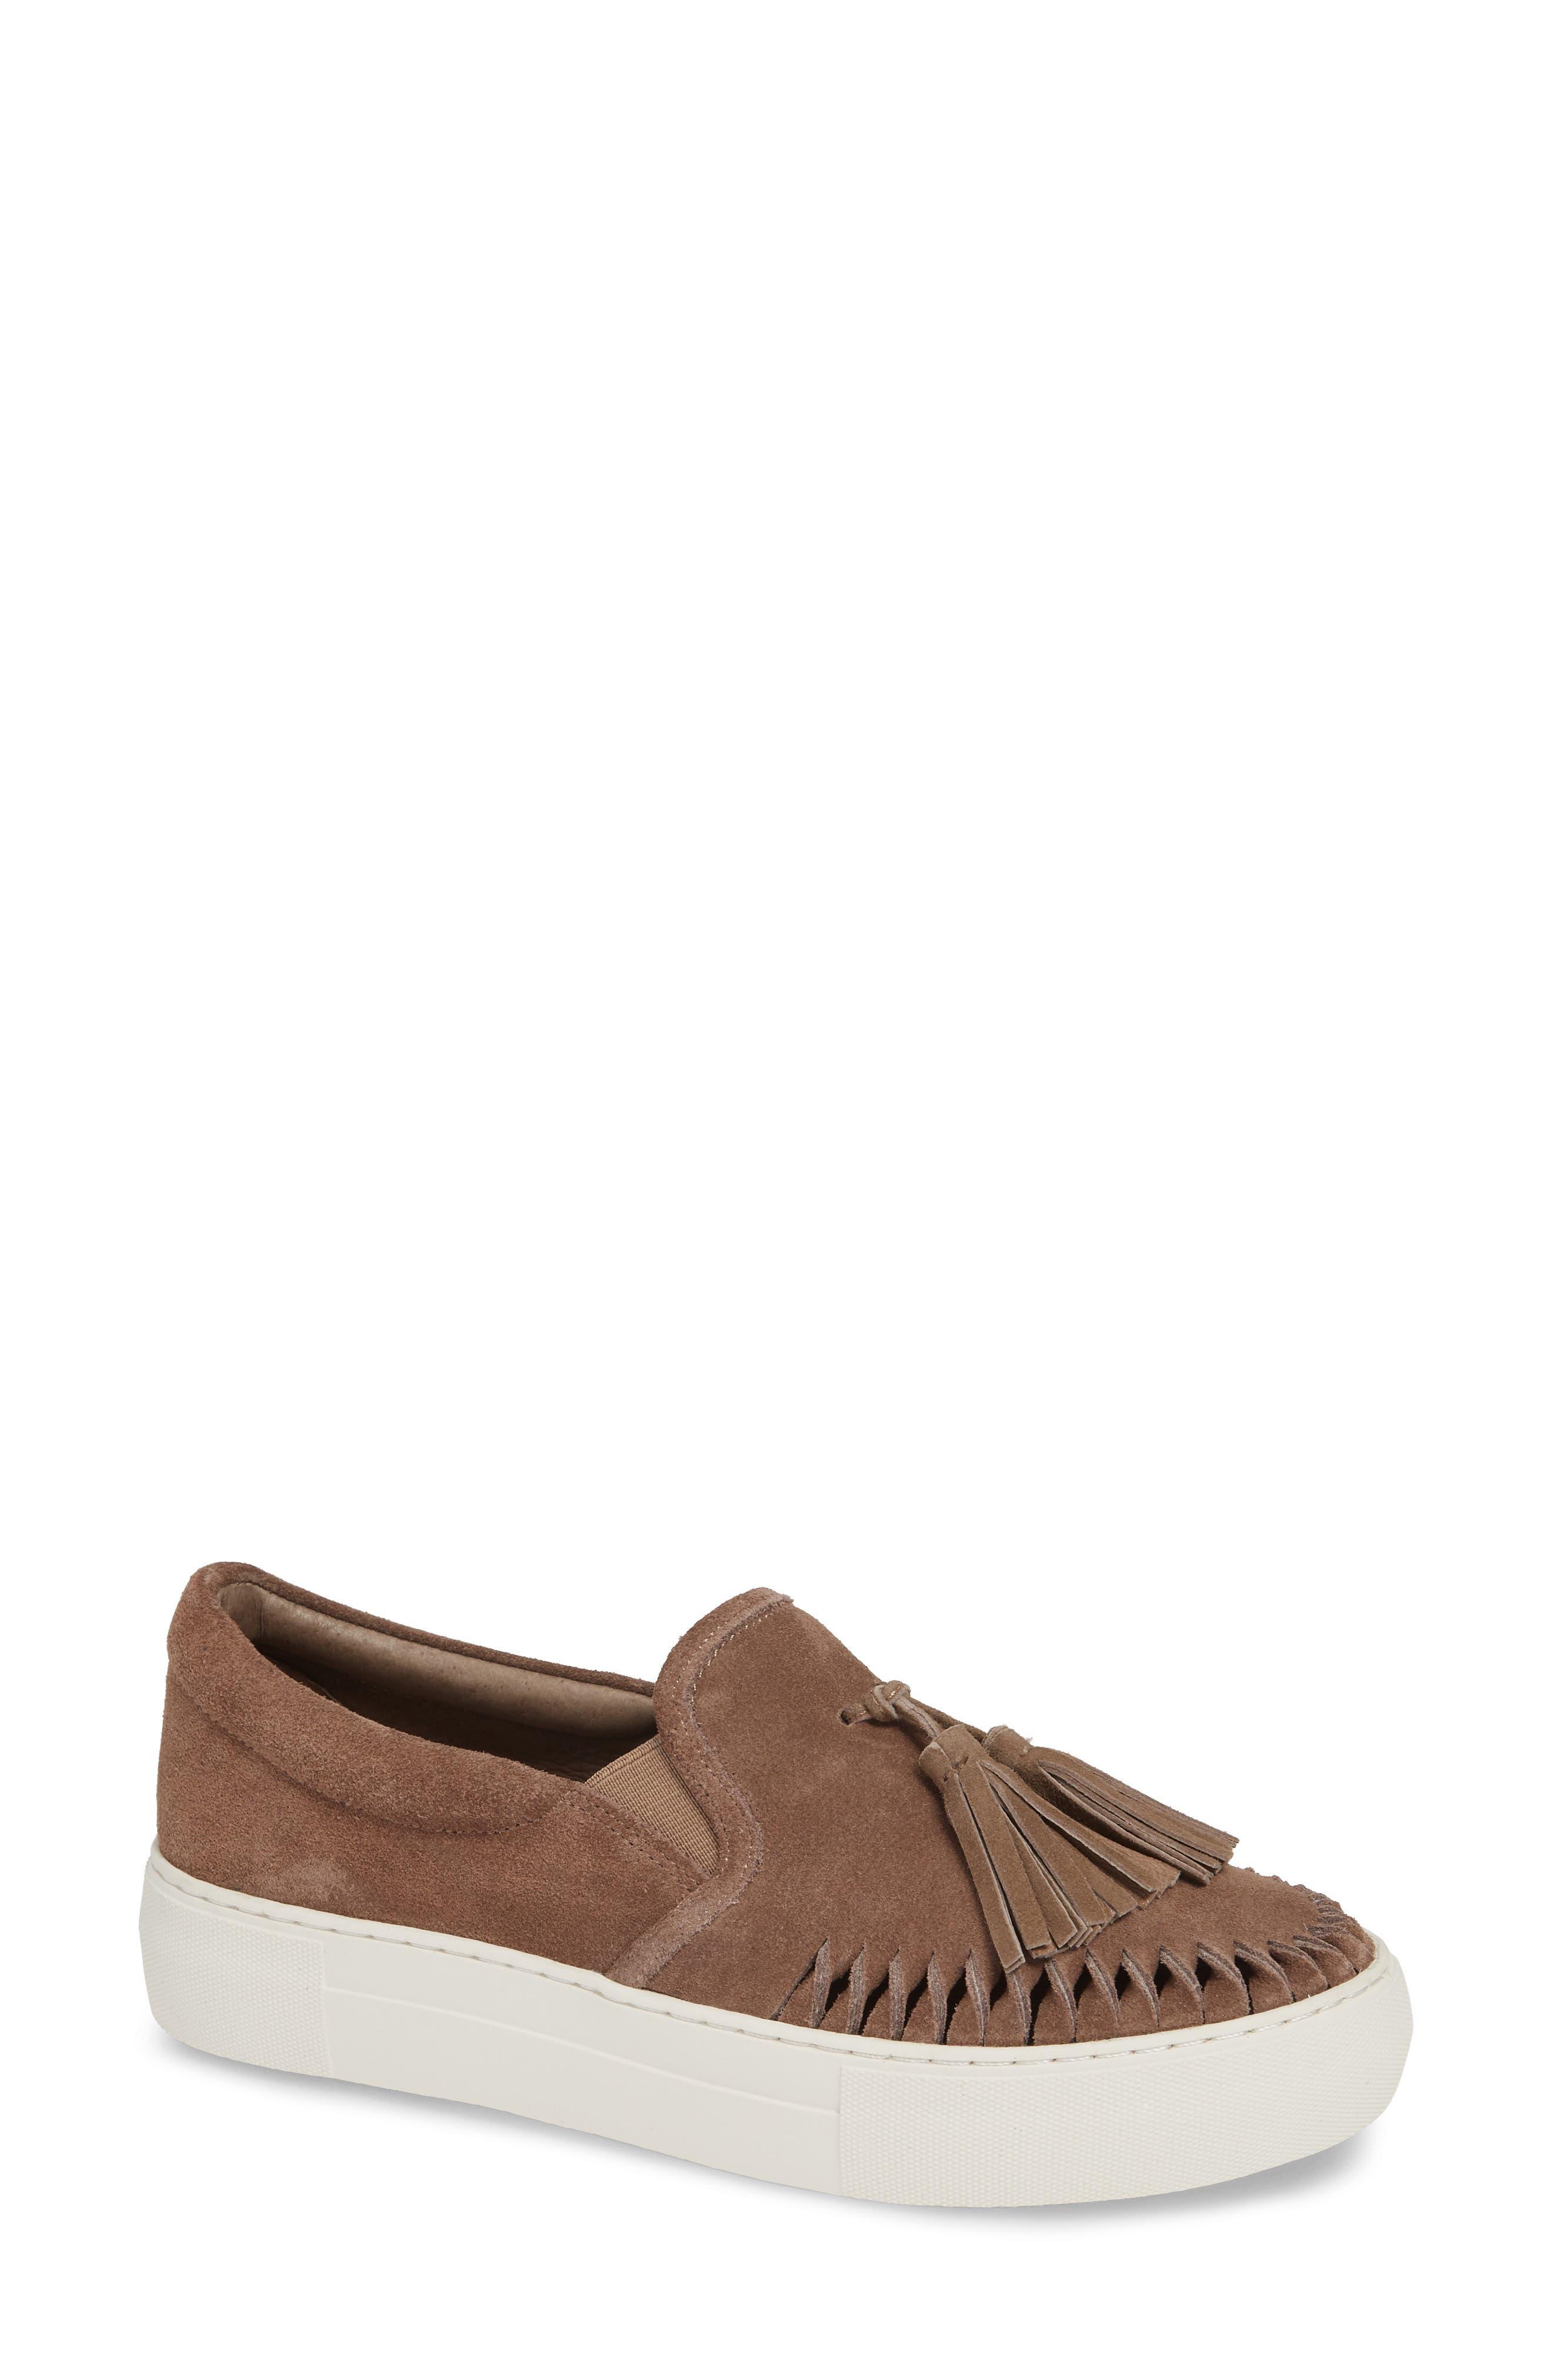 Jslides Tassel Slip-On Sneaker, Beige